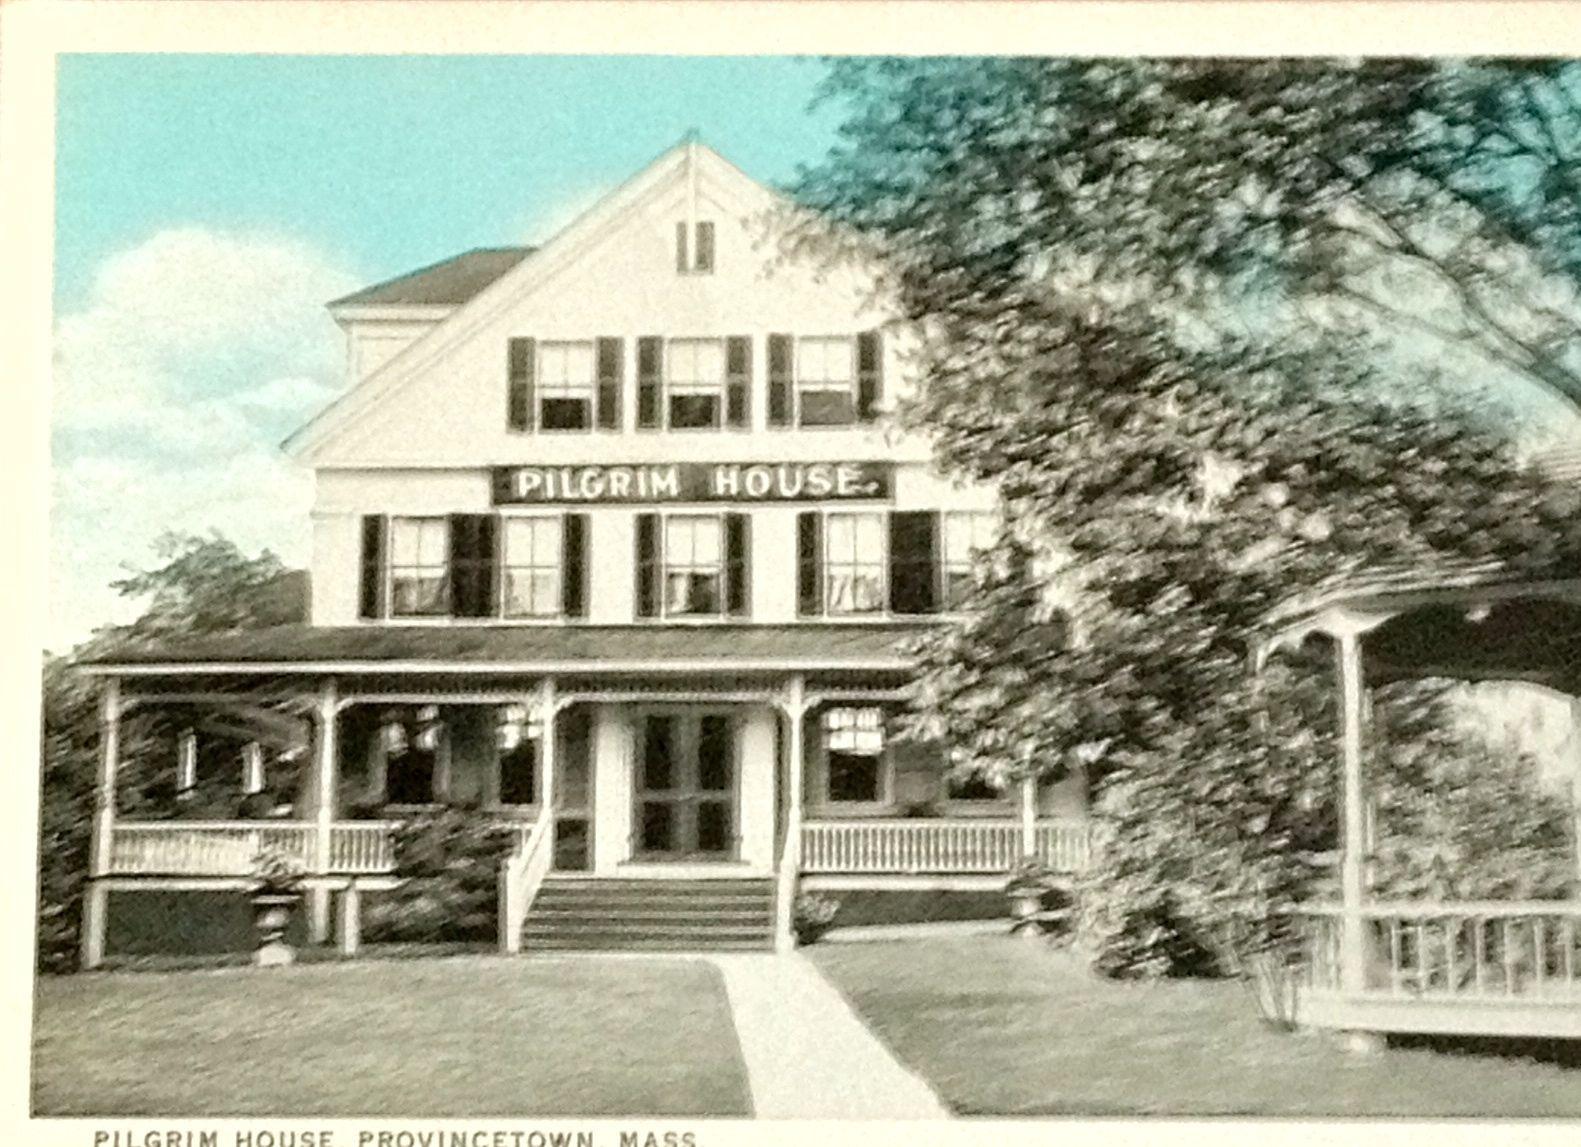 Pilgrimhouse Provincetown Massachusetts Built In 1781 Remaininginprovincetown Pilgrim House Provincetown House Styles